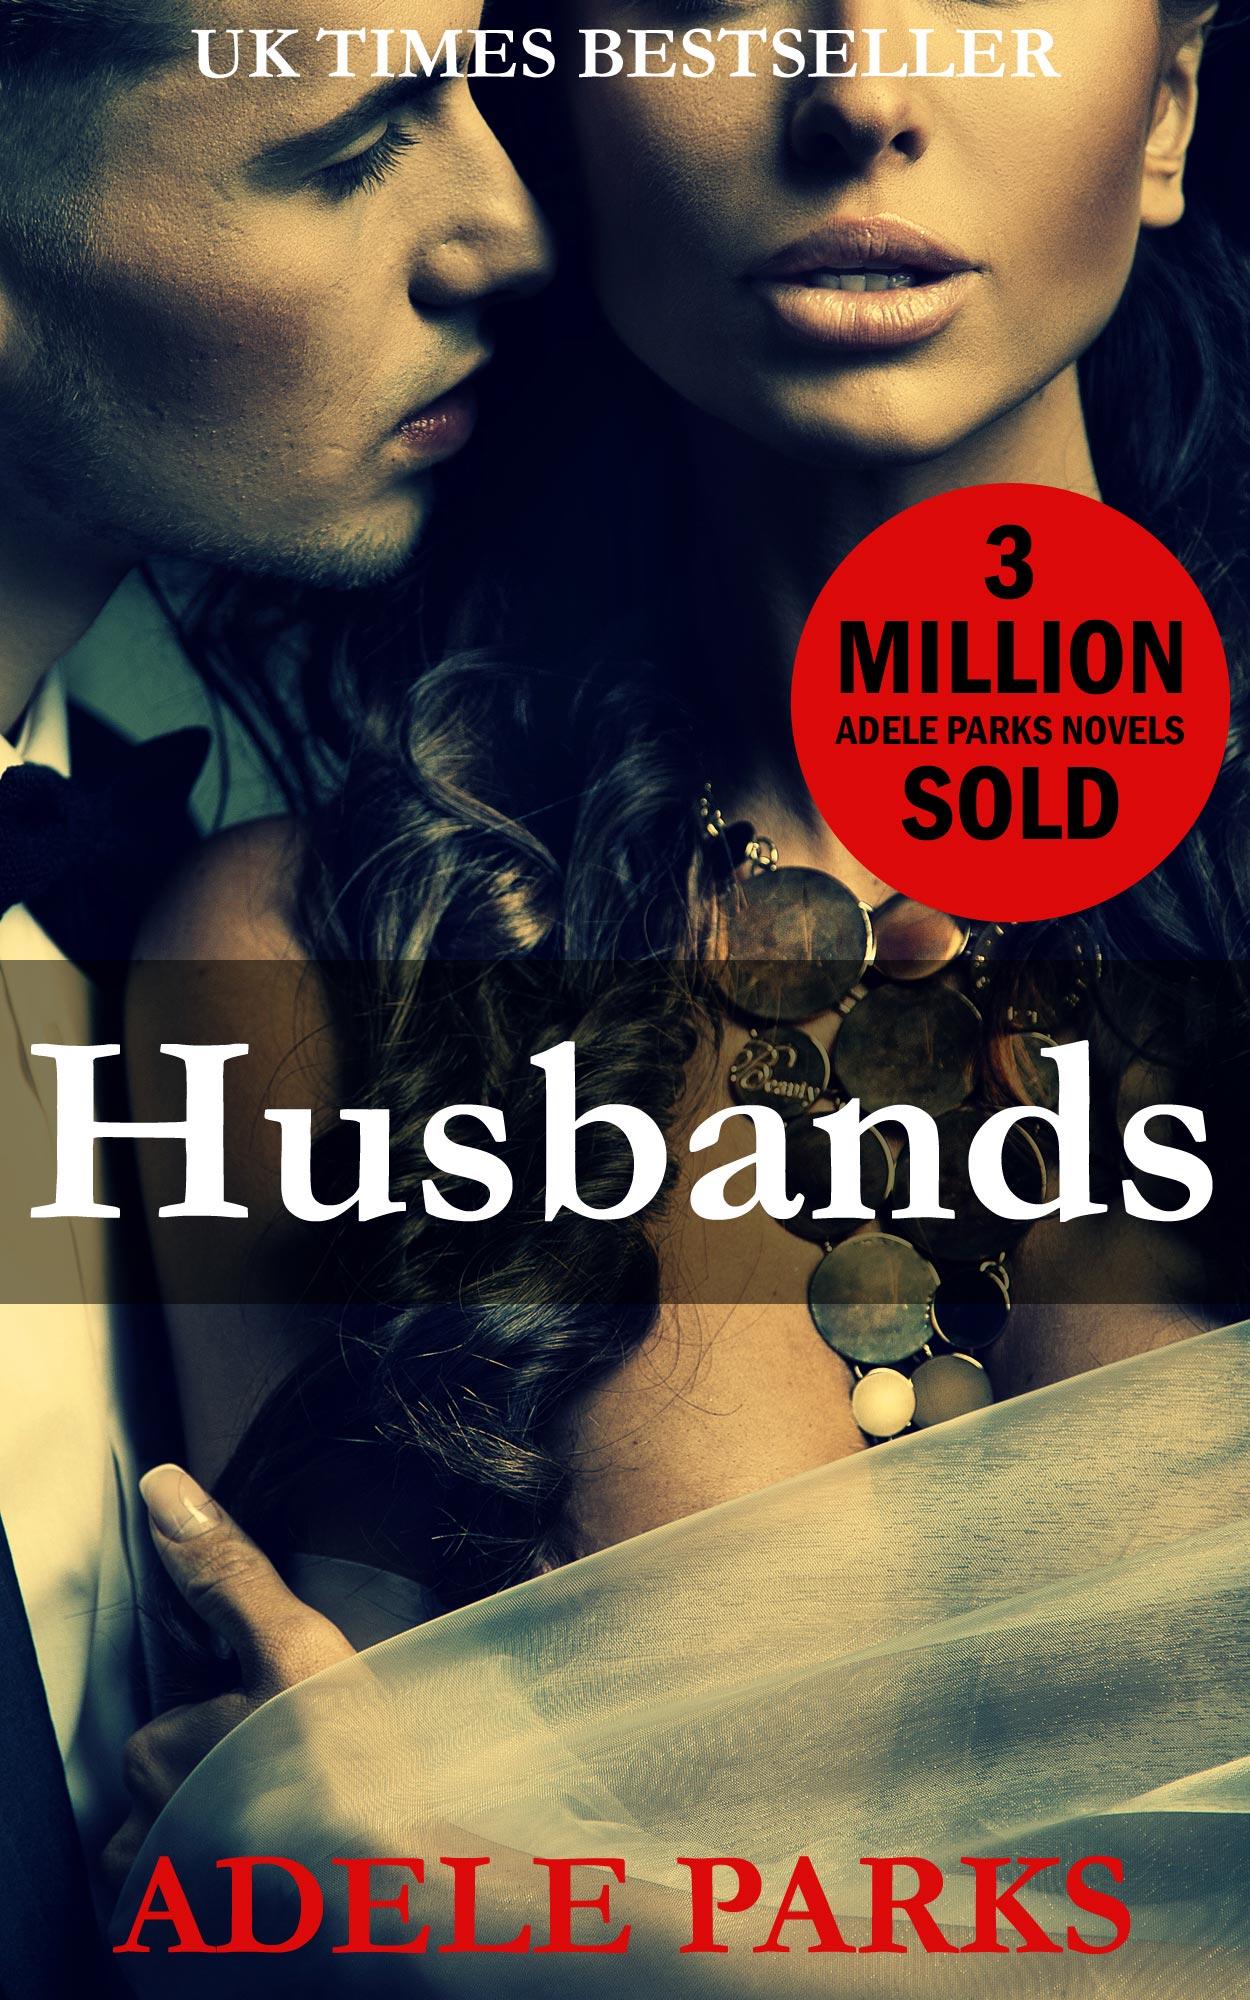 Husbands (USA) by Adele Parks